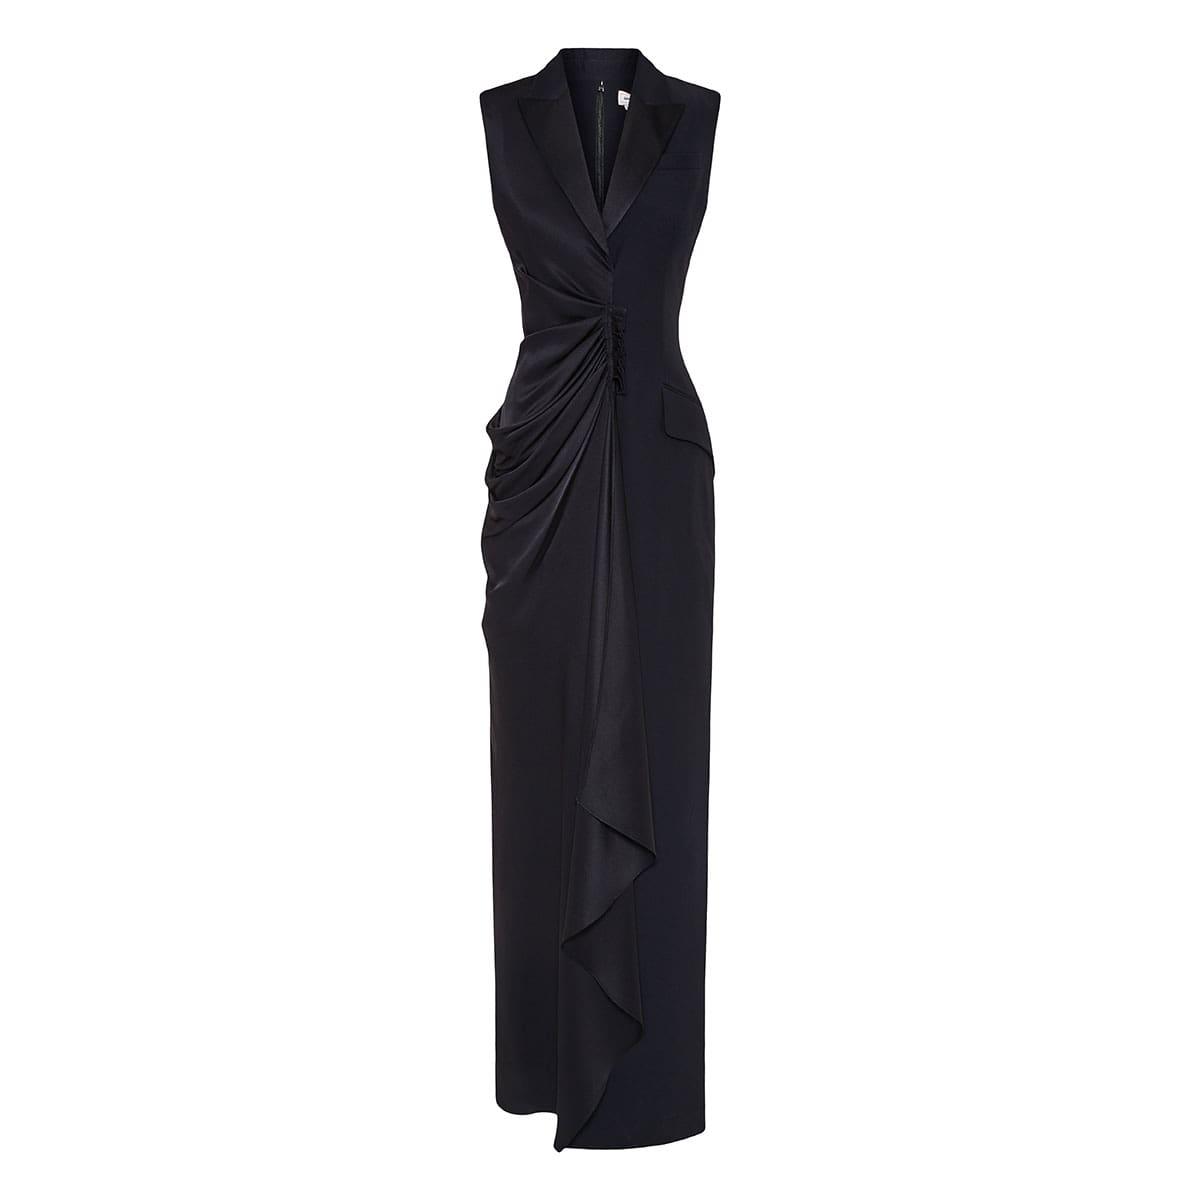 Asymmetric draped tuxedo dress